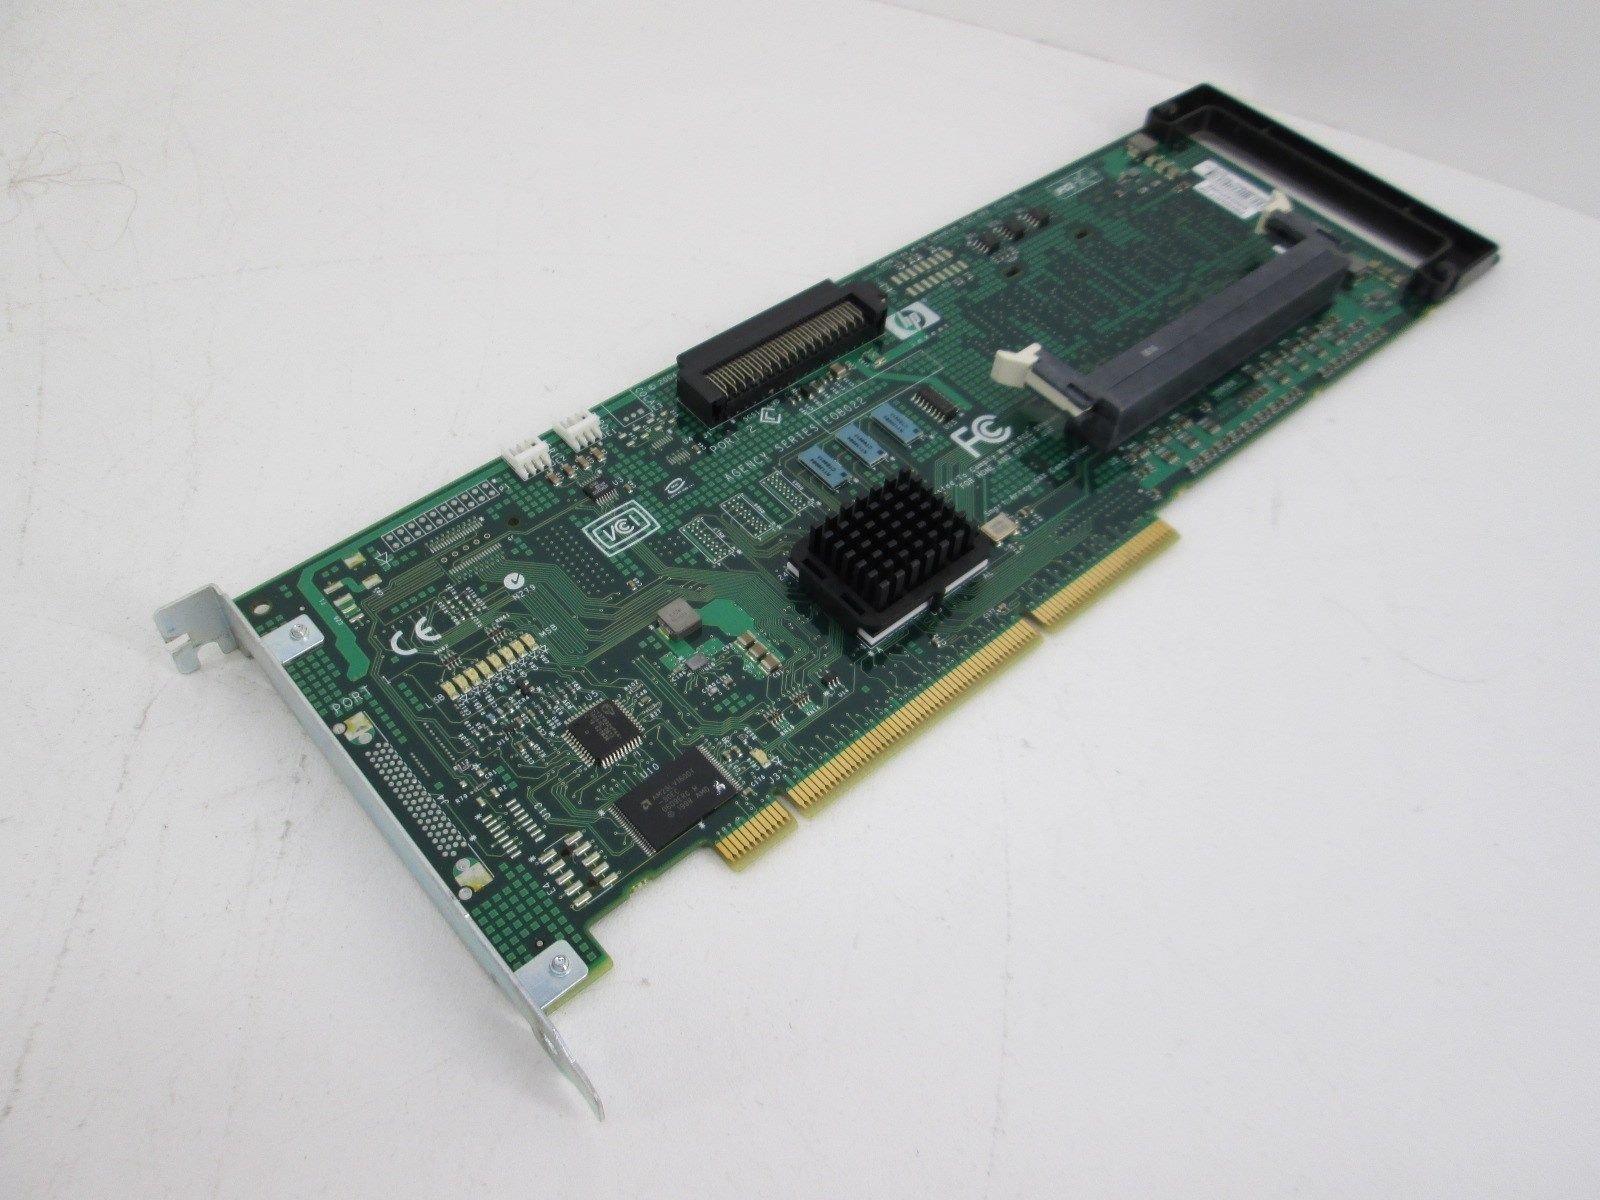 NEW DRIVER: ADAPTEC COMPAQ PCI-X 133MHZ 2CH U320 SCSI ADAPTER